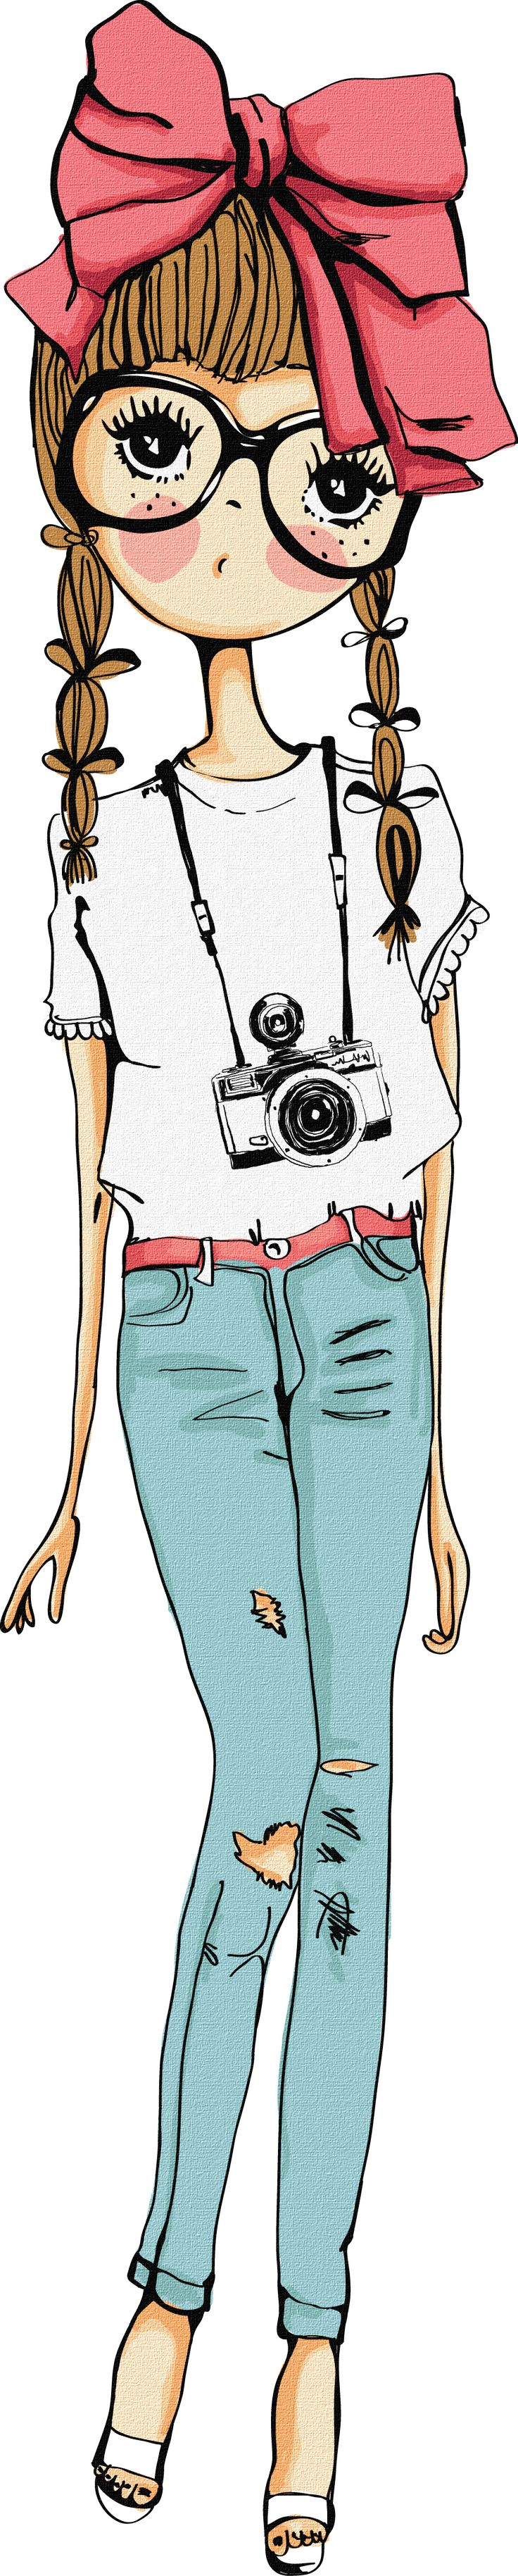 dibujos mujeres tumblr - Buscar con Google